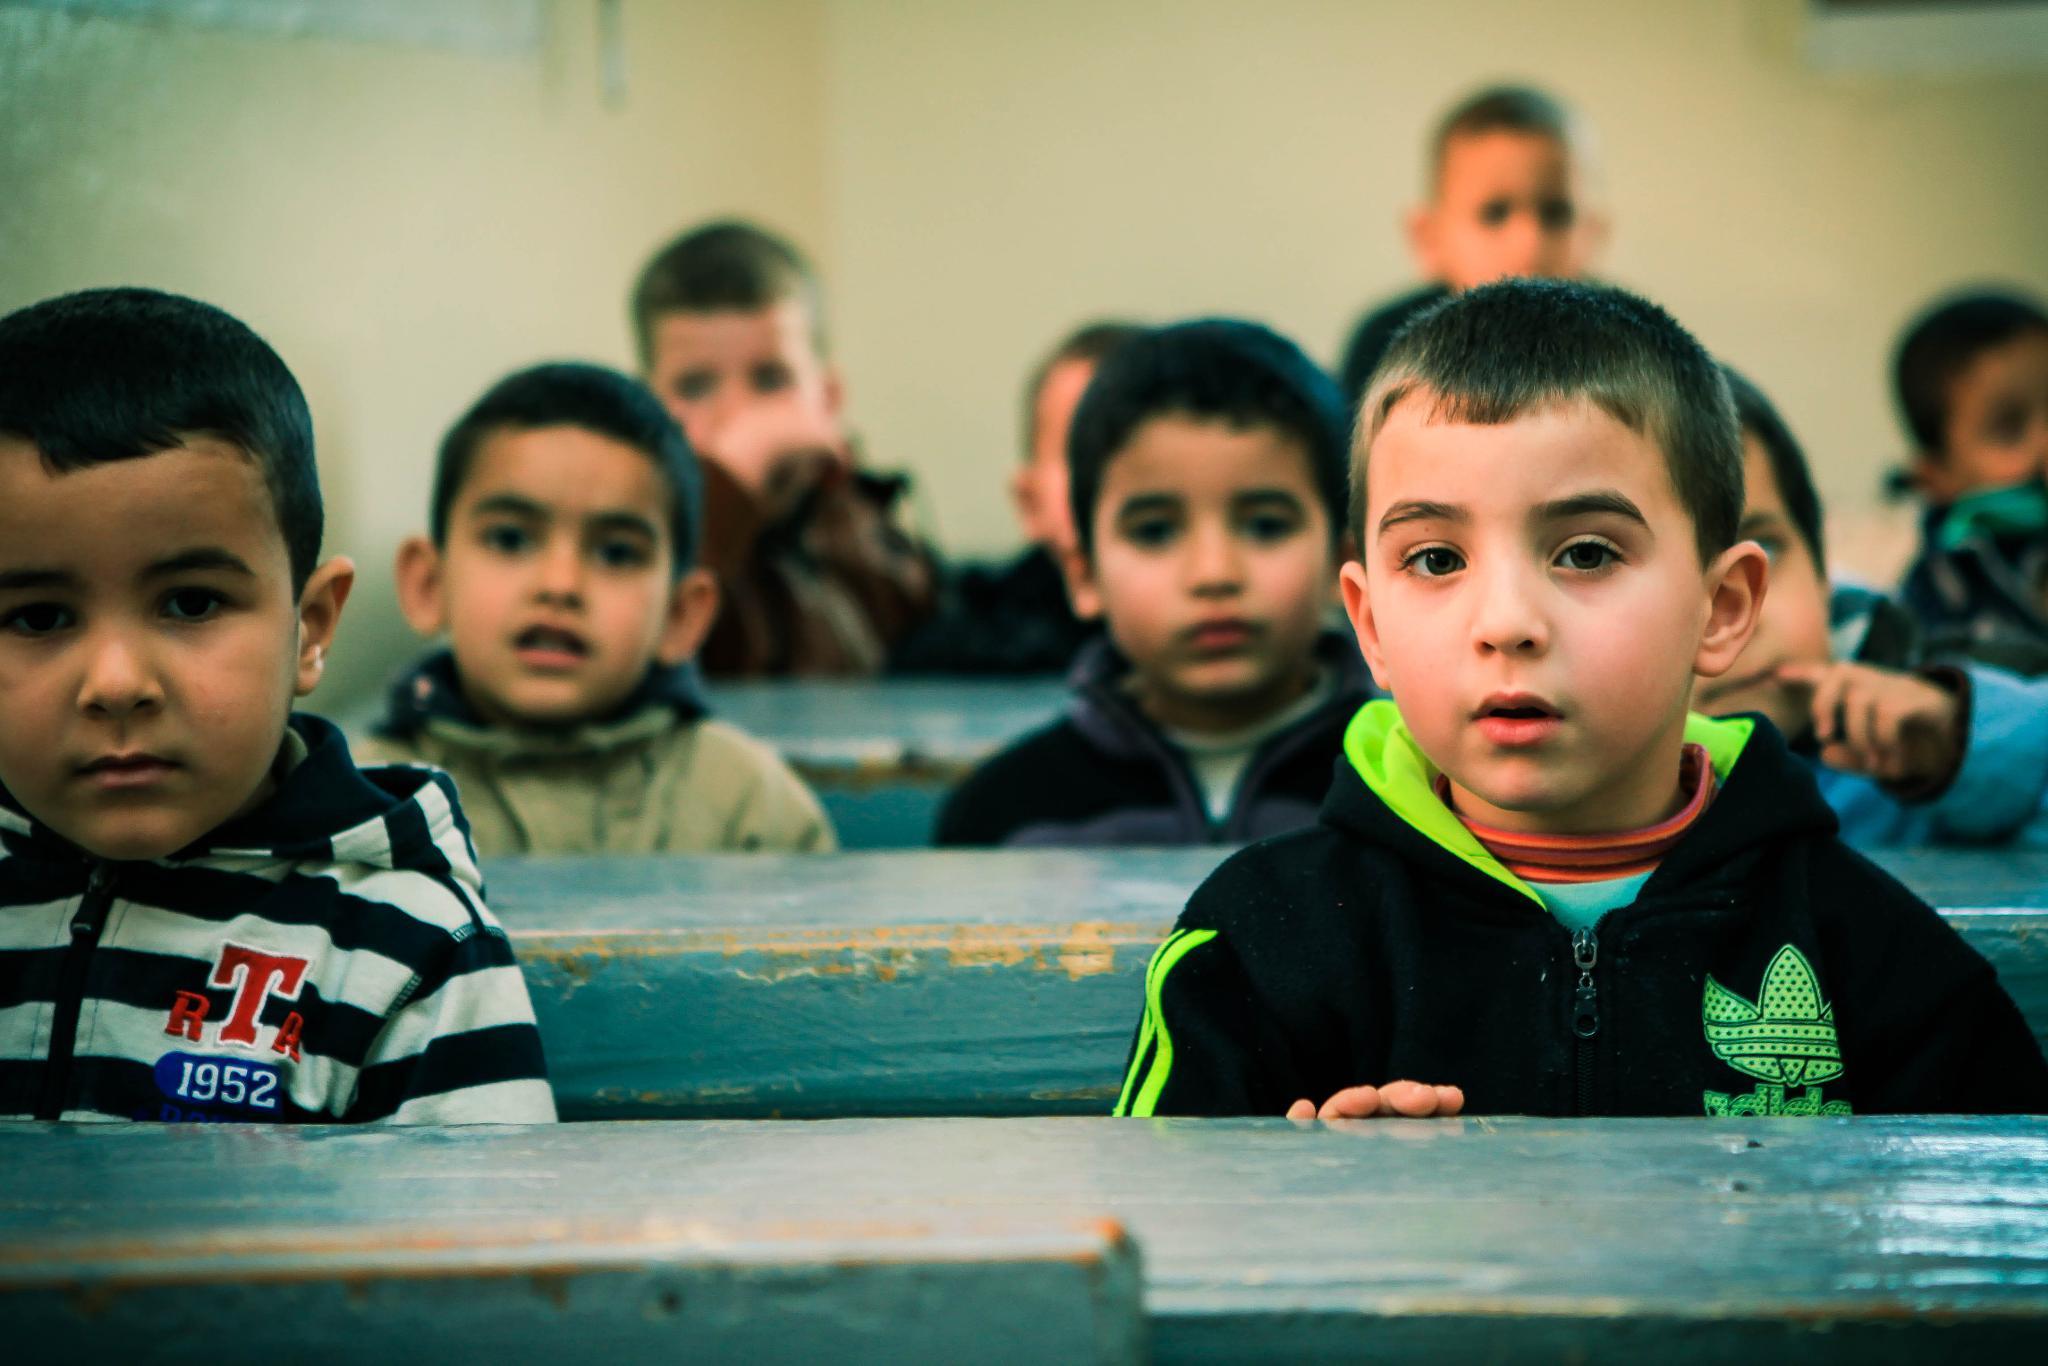 Moroccan schools by Badr Charaf